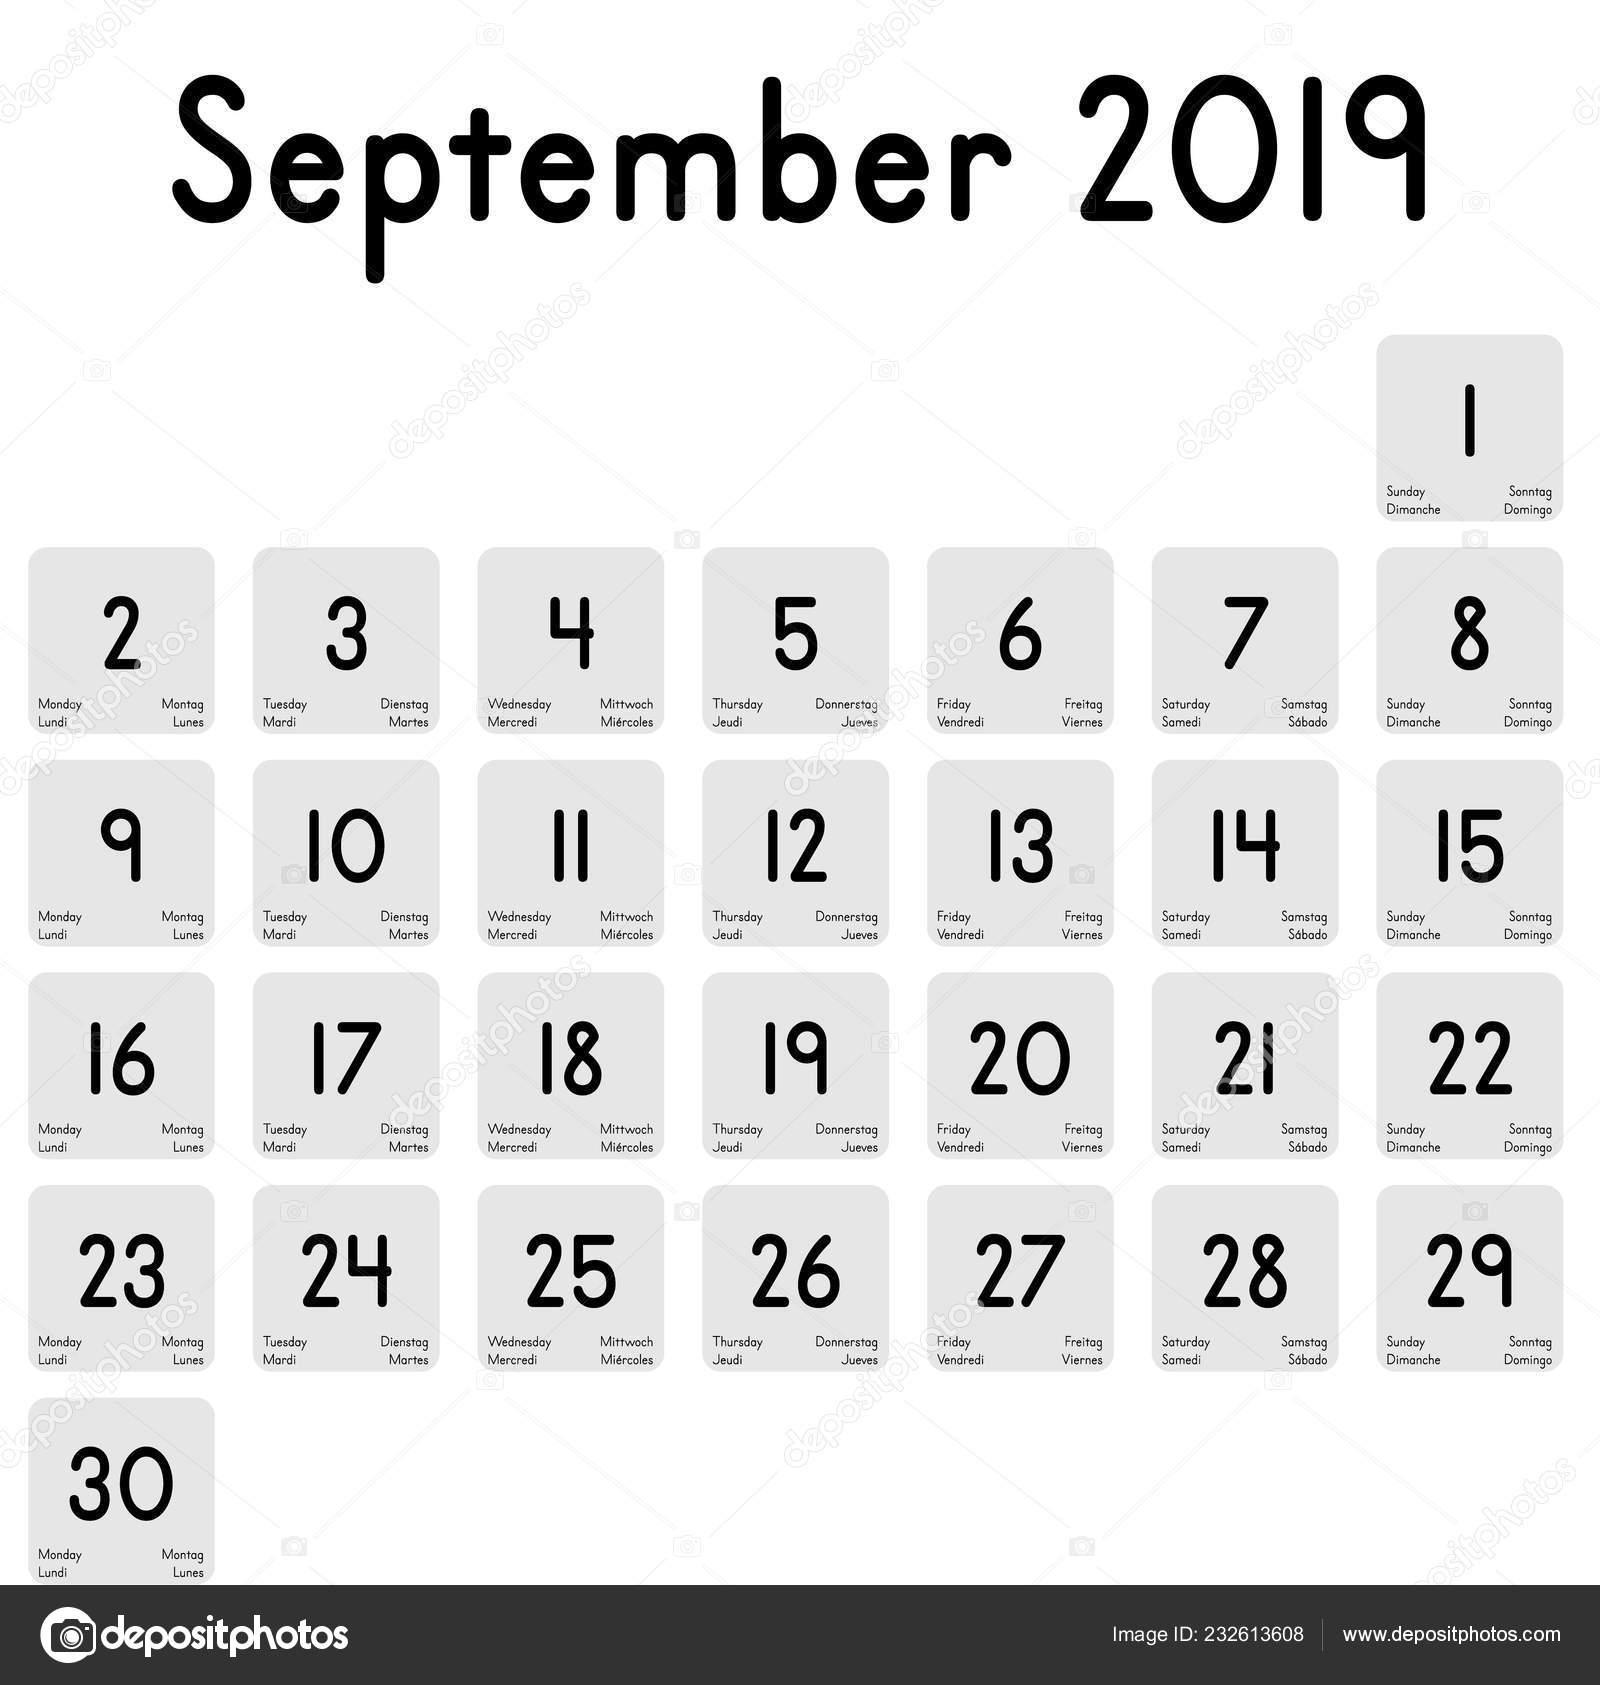 Calendario Diario.Detallado Calendario Diario Del Mes Septiembre 2019 Vector